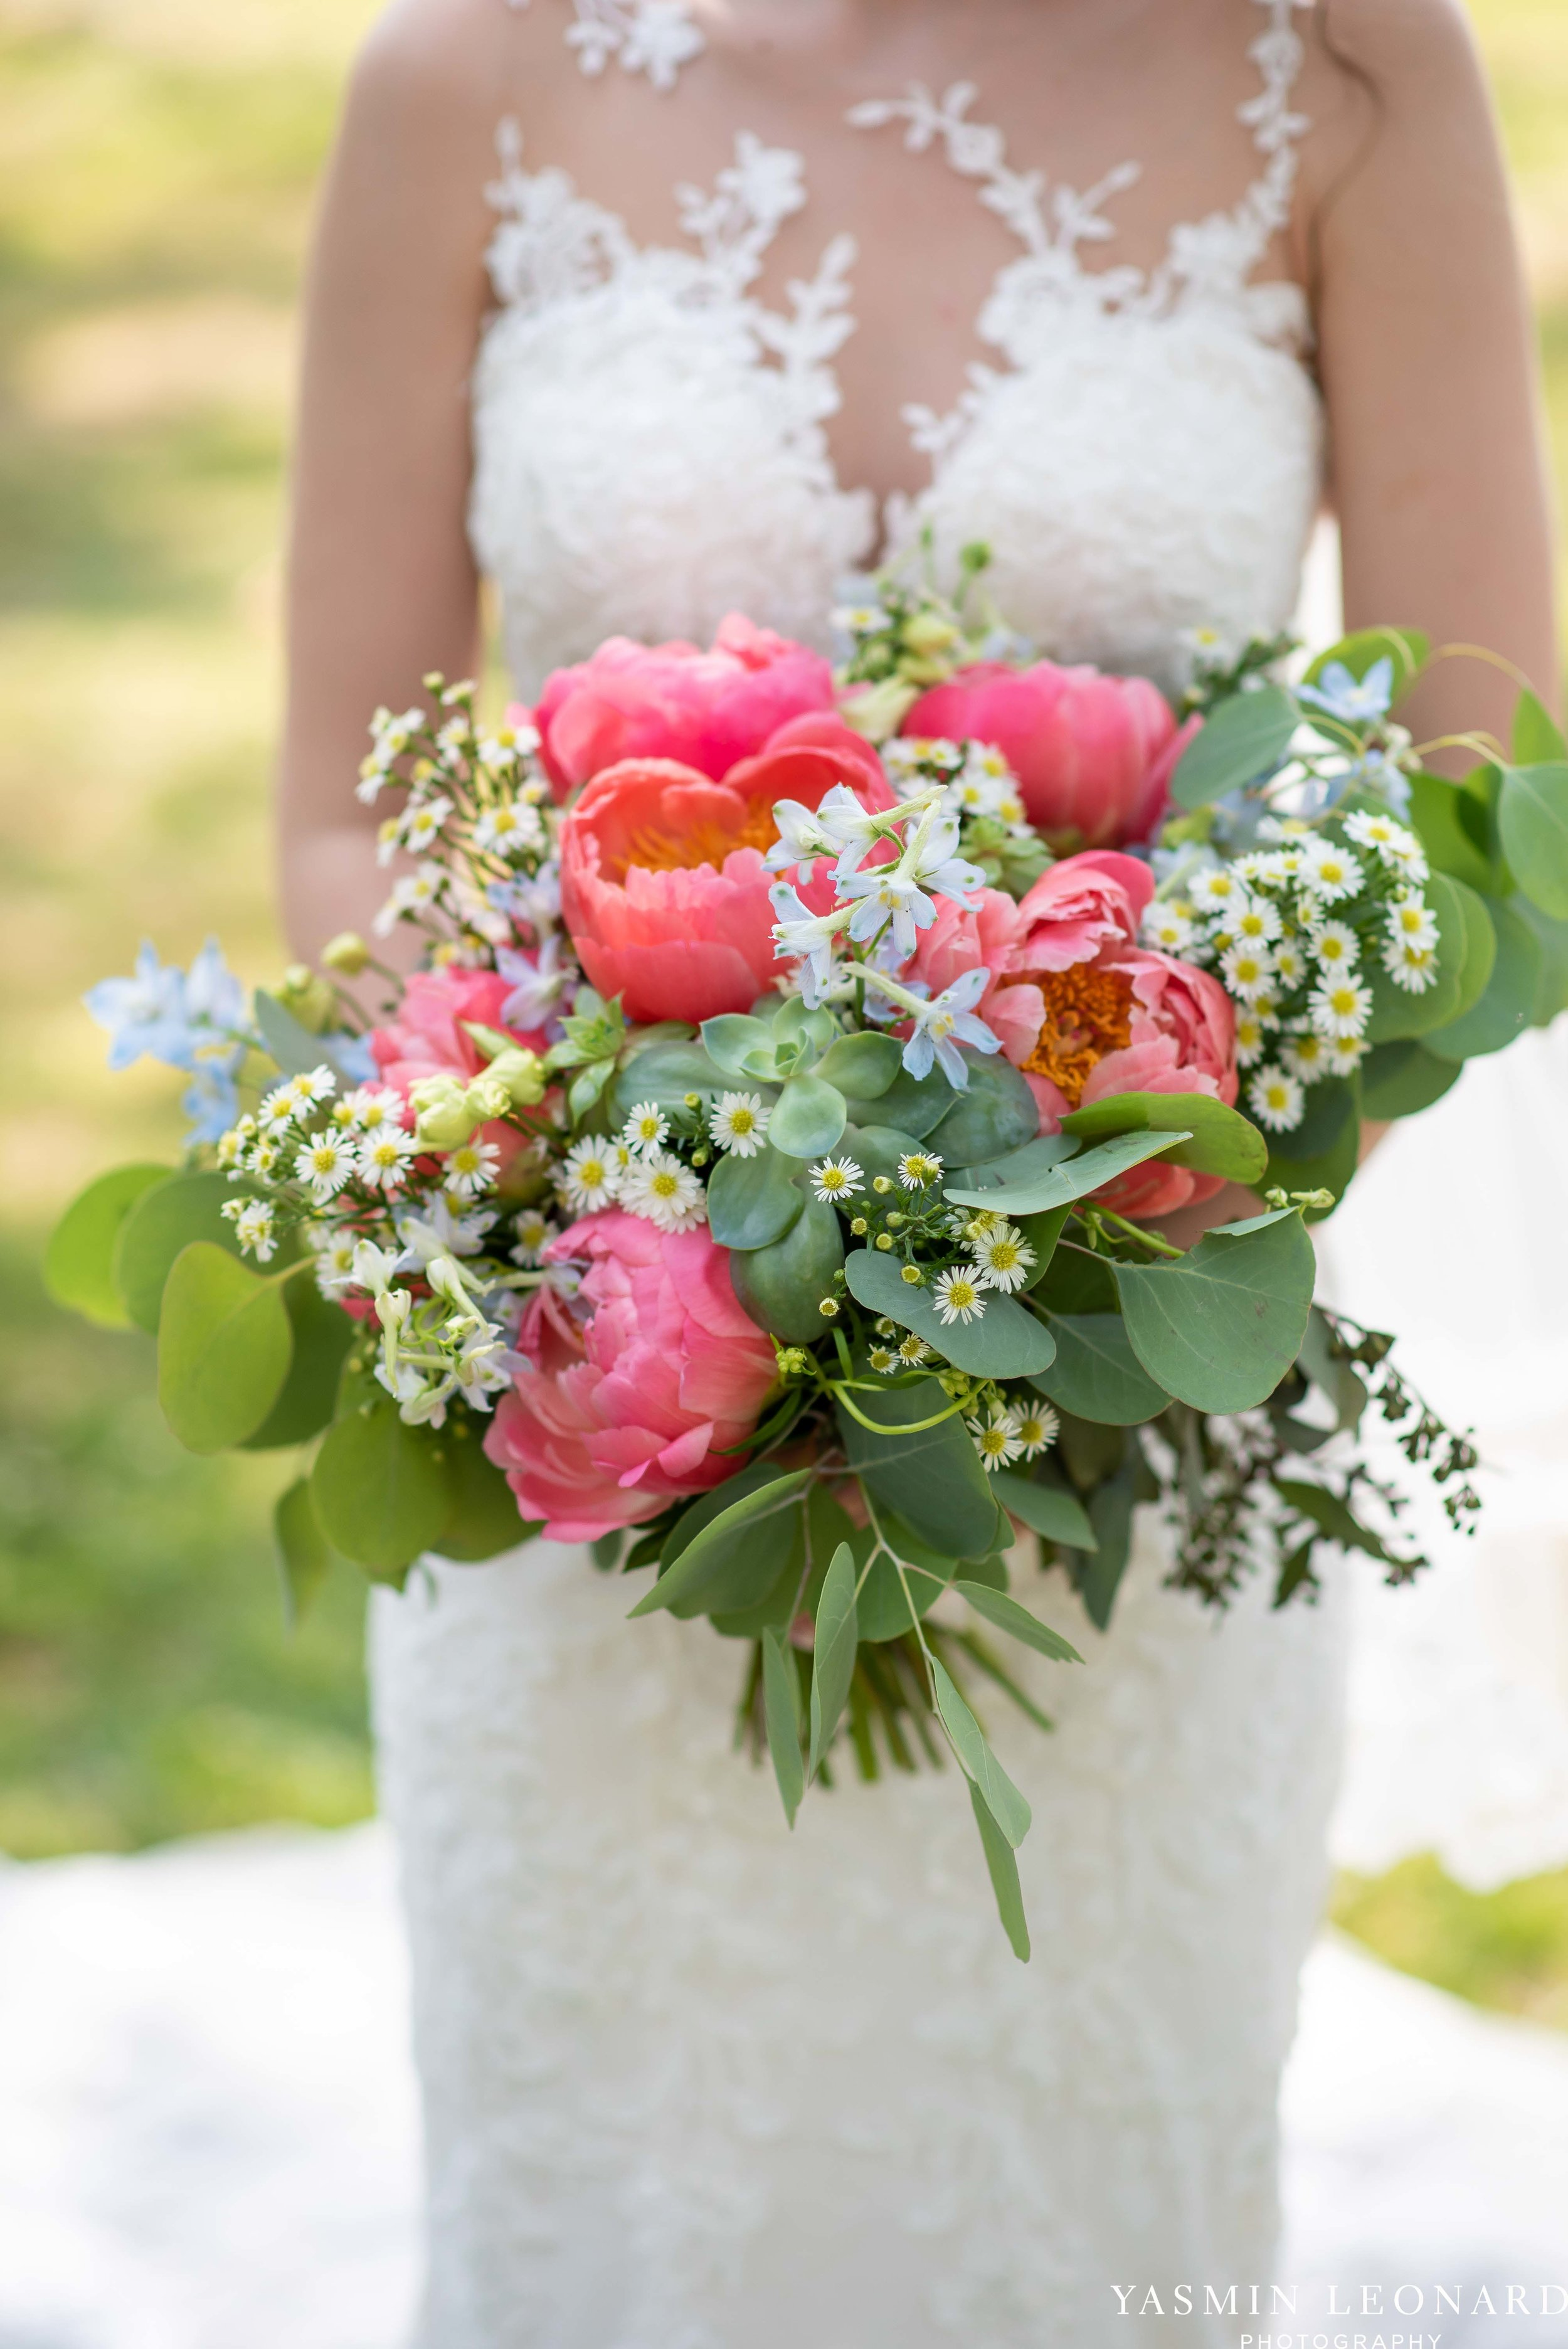 Old Homeplace Vineyard - NC Weddings - Outdoor Summer Weddings - Peony Boutique - Vineyard Wedding - NC Photographer - Yasmin Leonard Photography-12.jpg